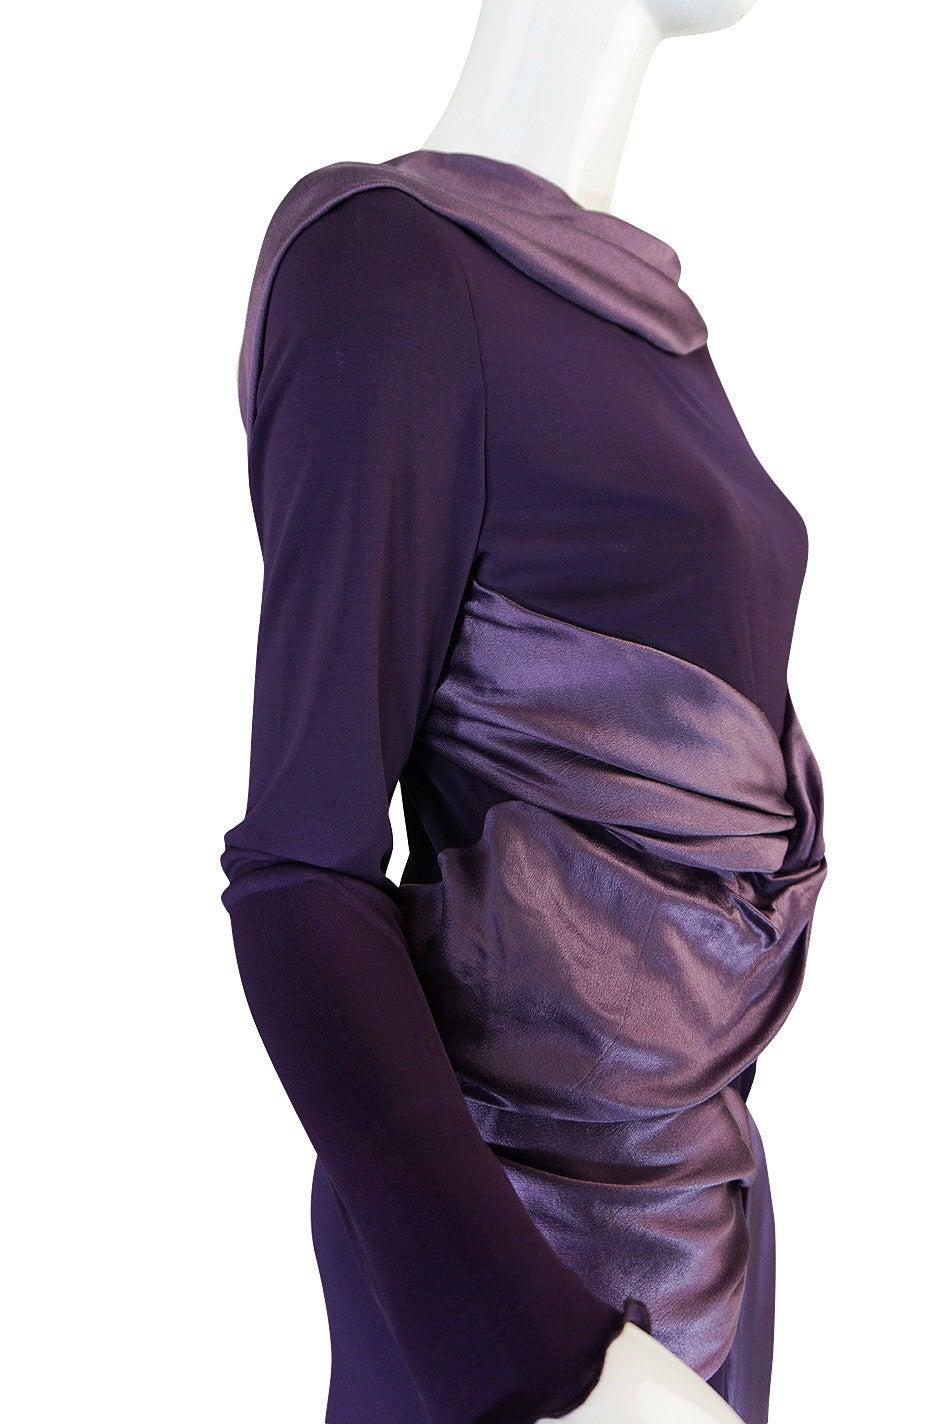 Black 2004 F/W Alexander McQueen Purple Tie Runway Dress For Sale